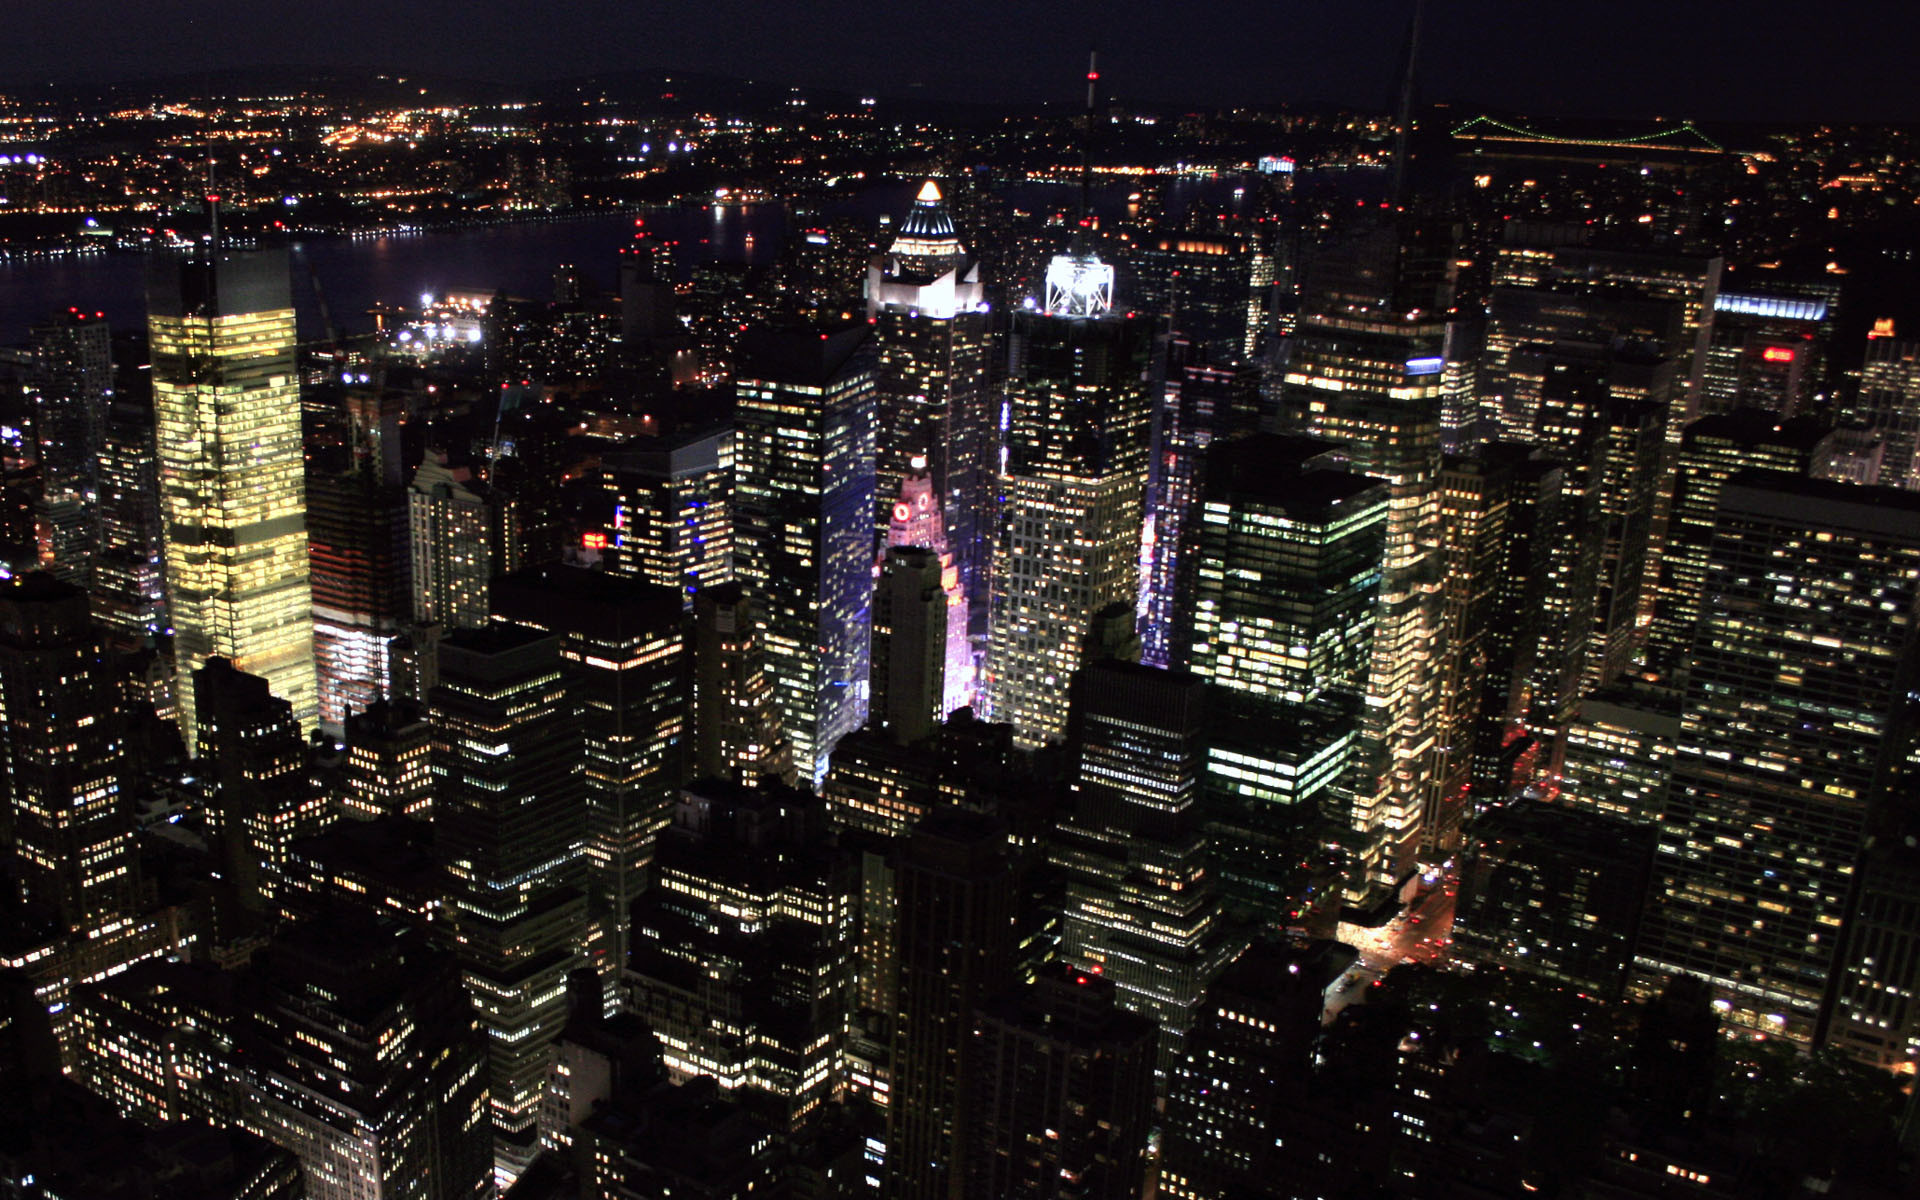 New York City Wallpaper At Night